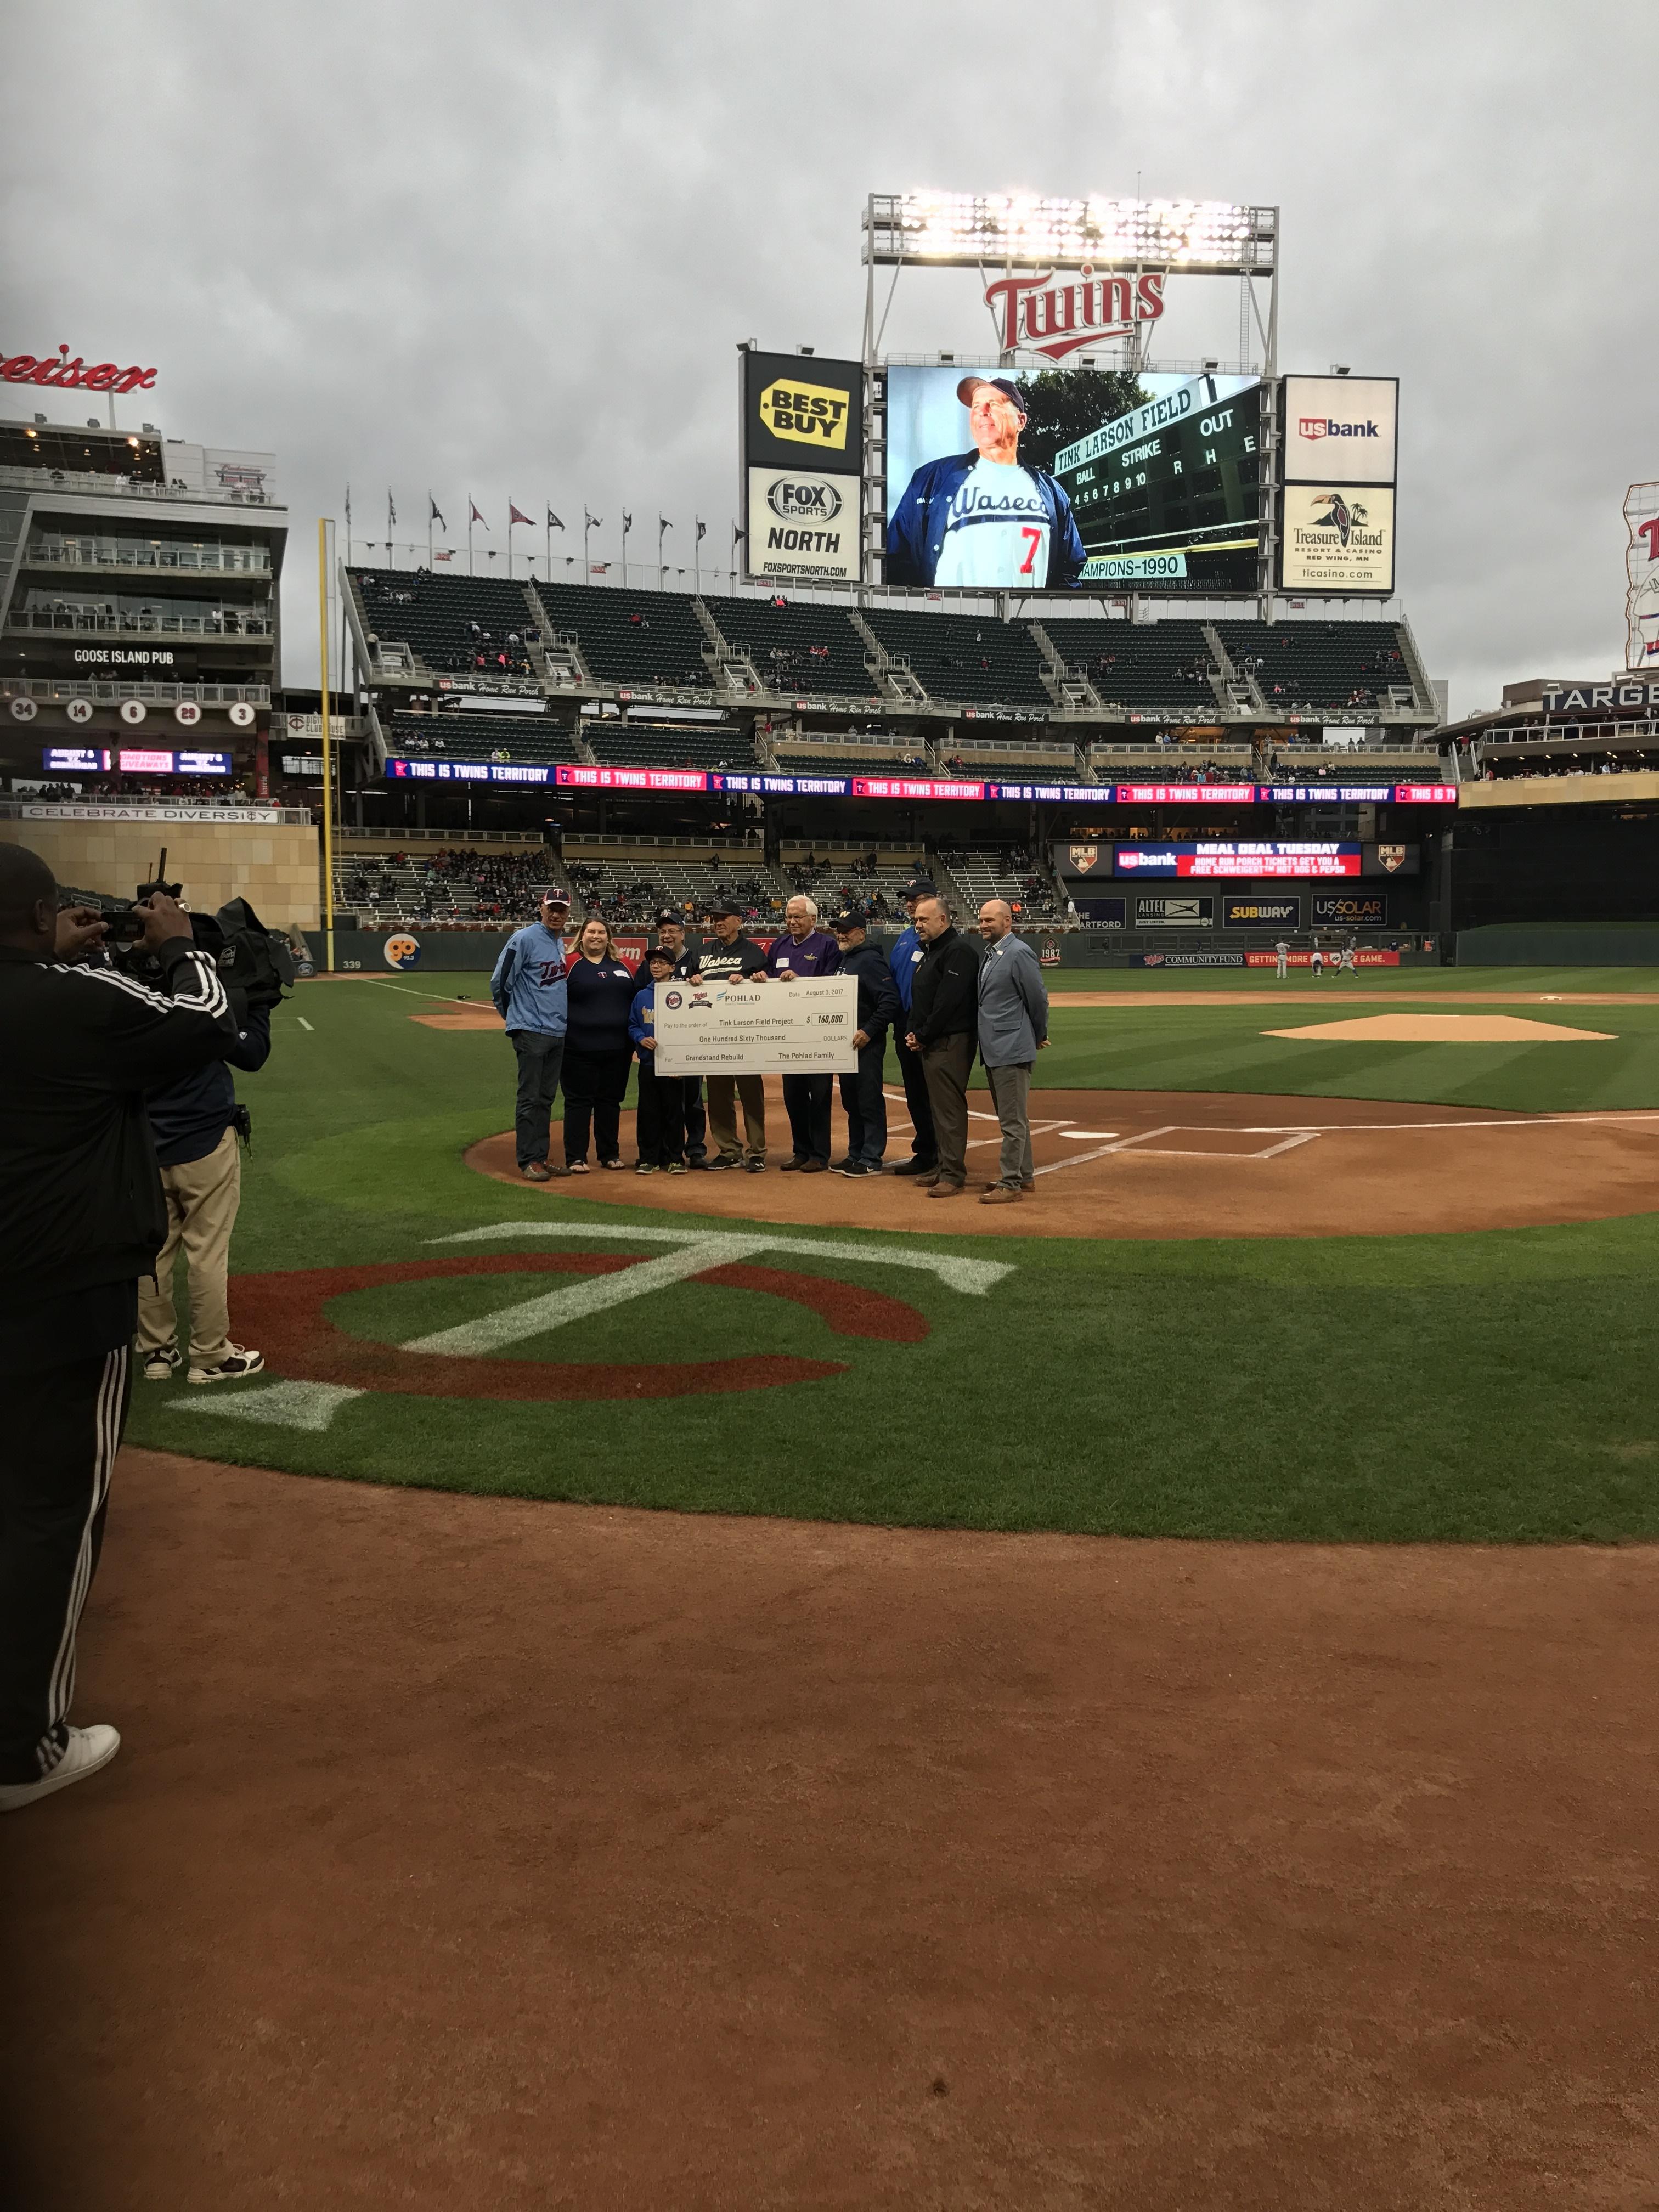 Group Holding Giant Check for Photo on Twins Baseball Diamond